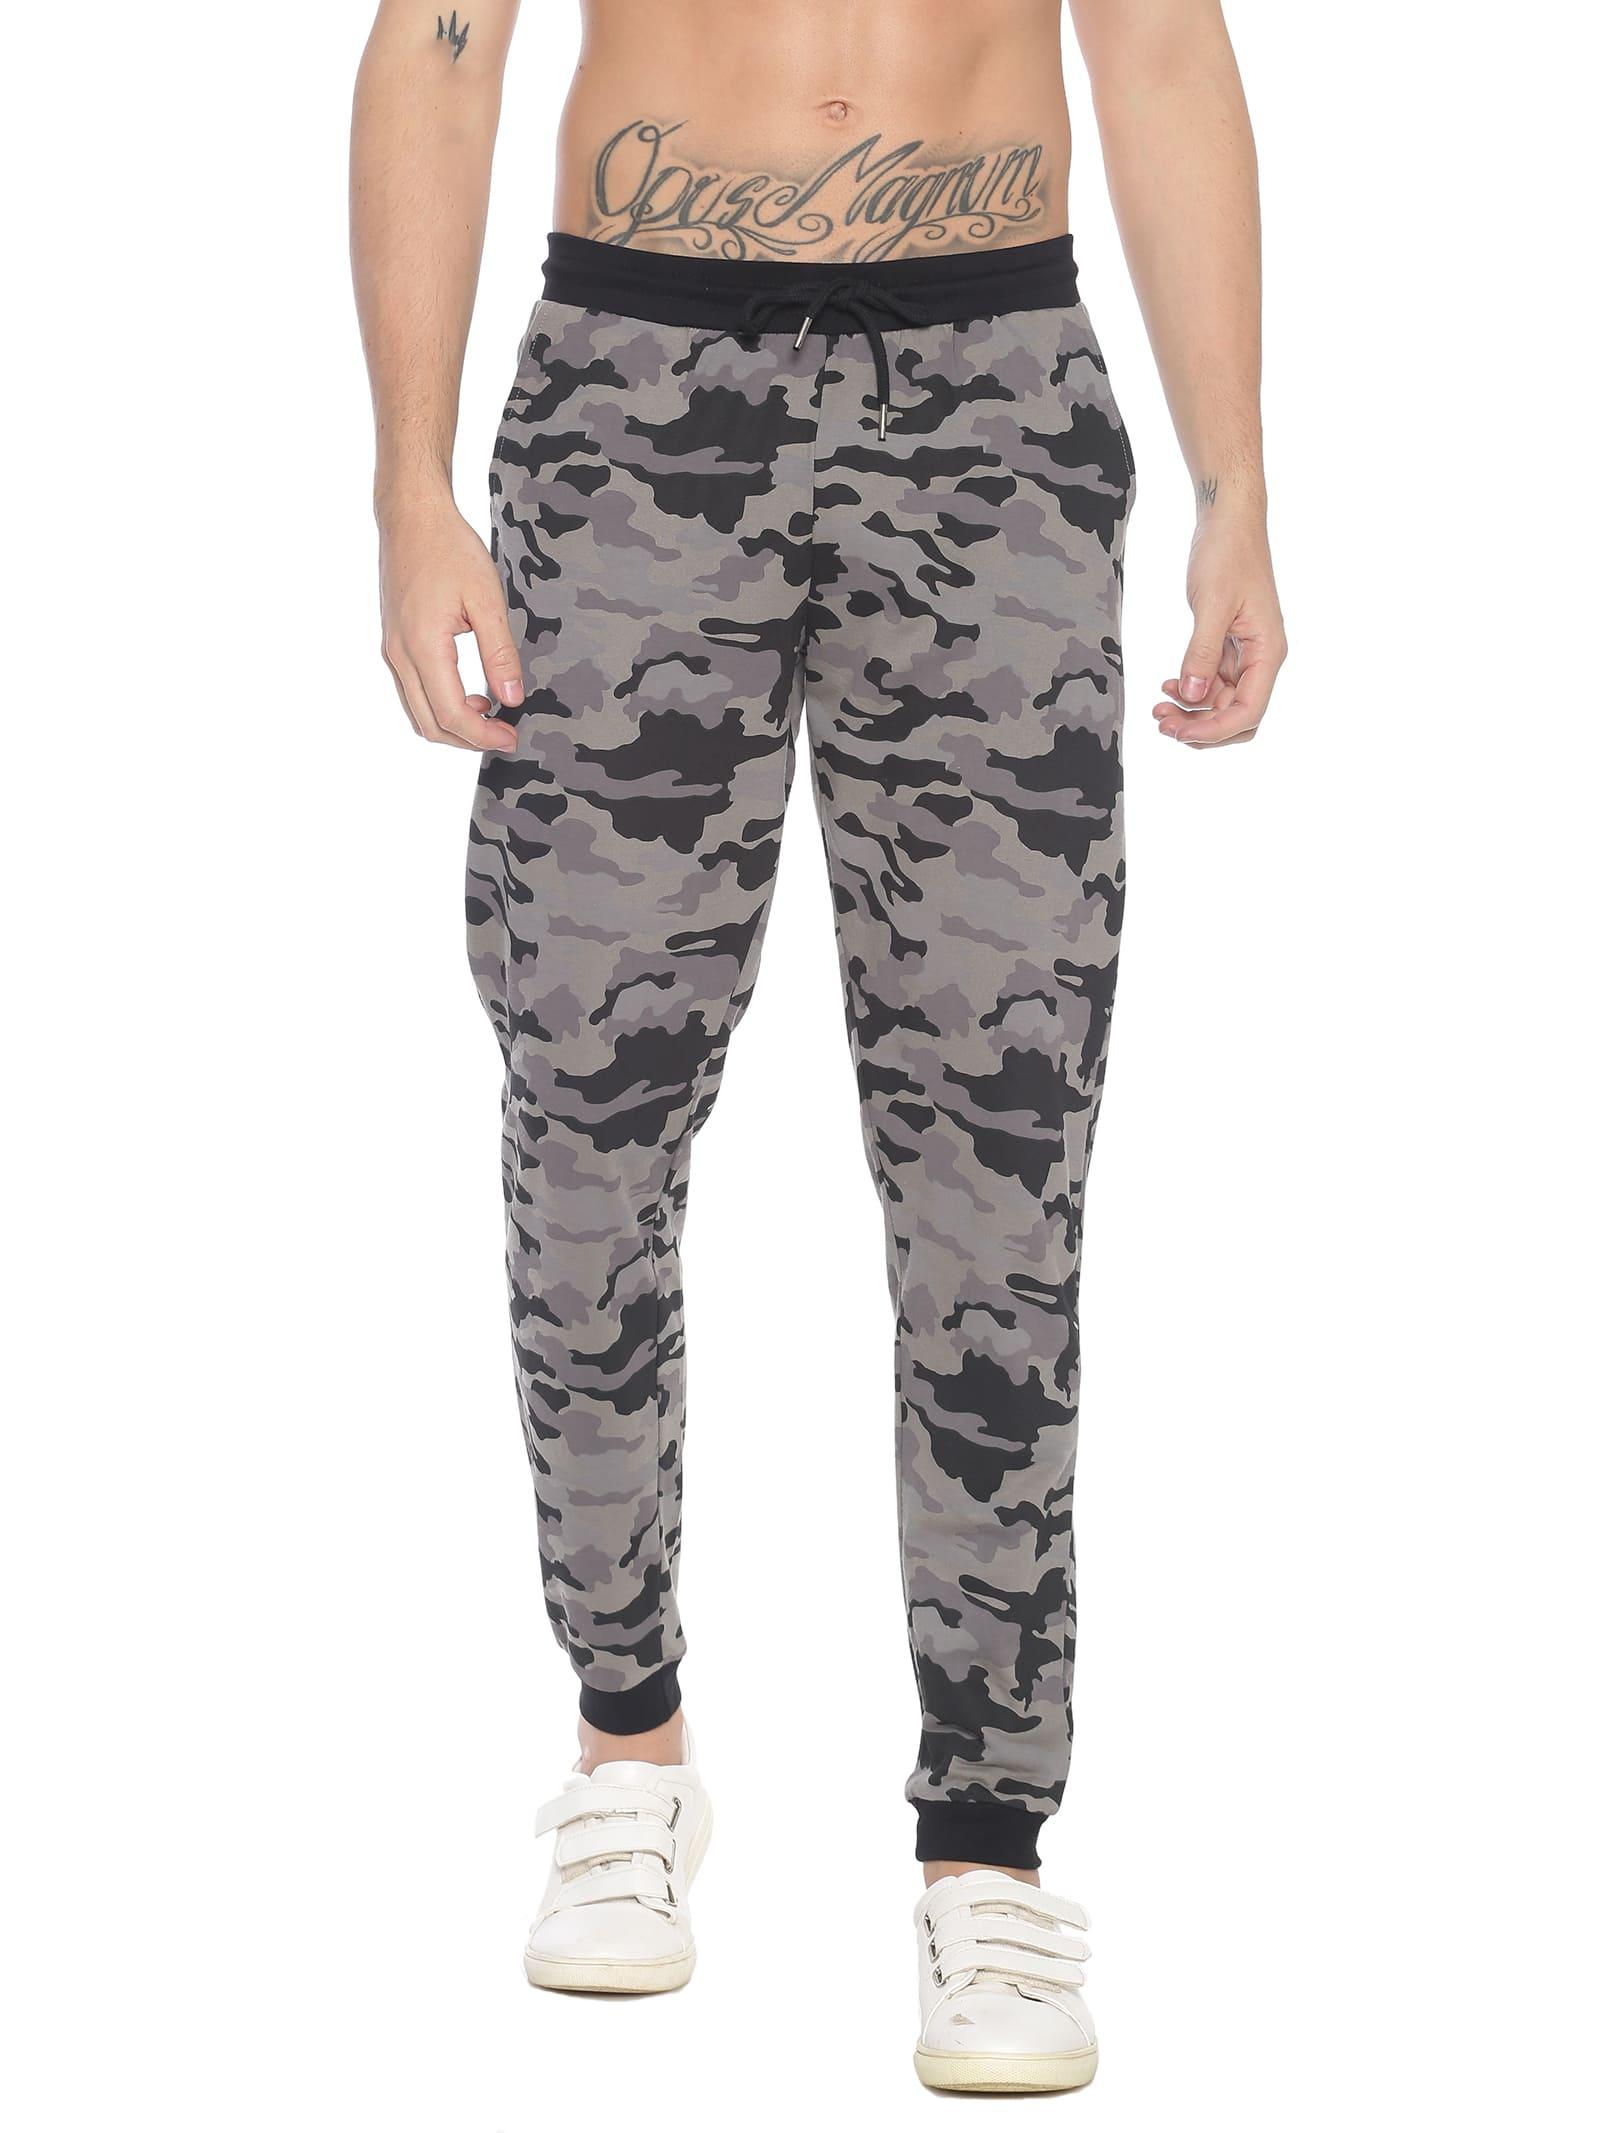 Grey-Black Camouflage Joggers